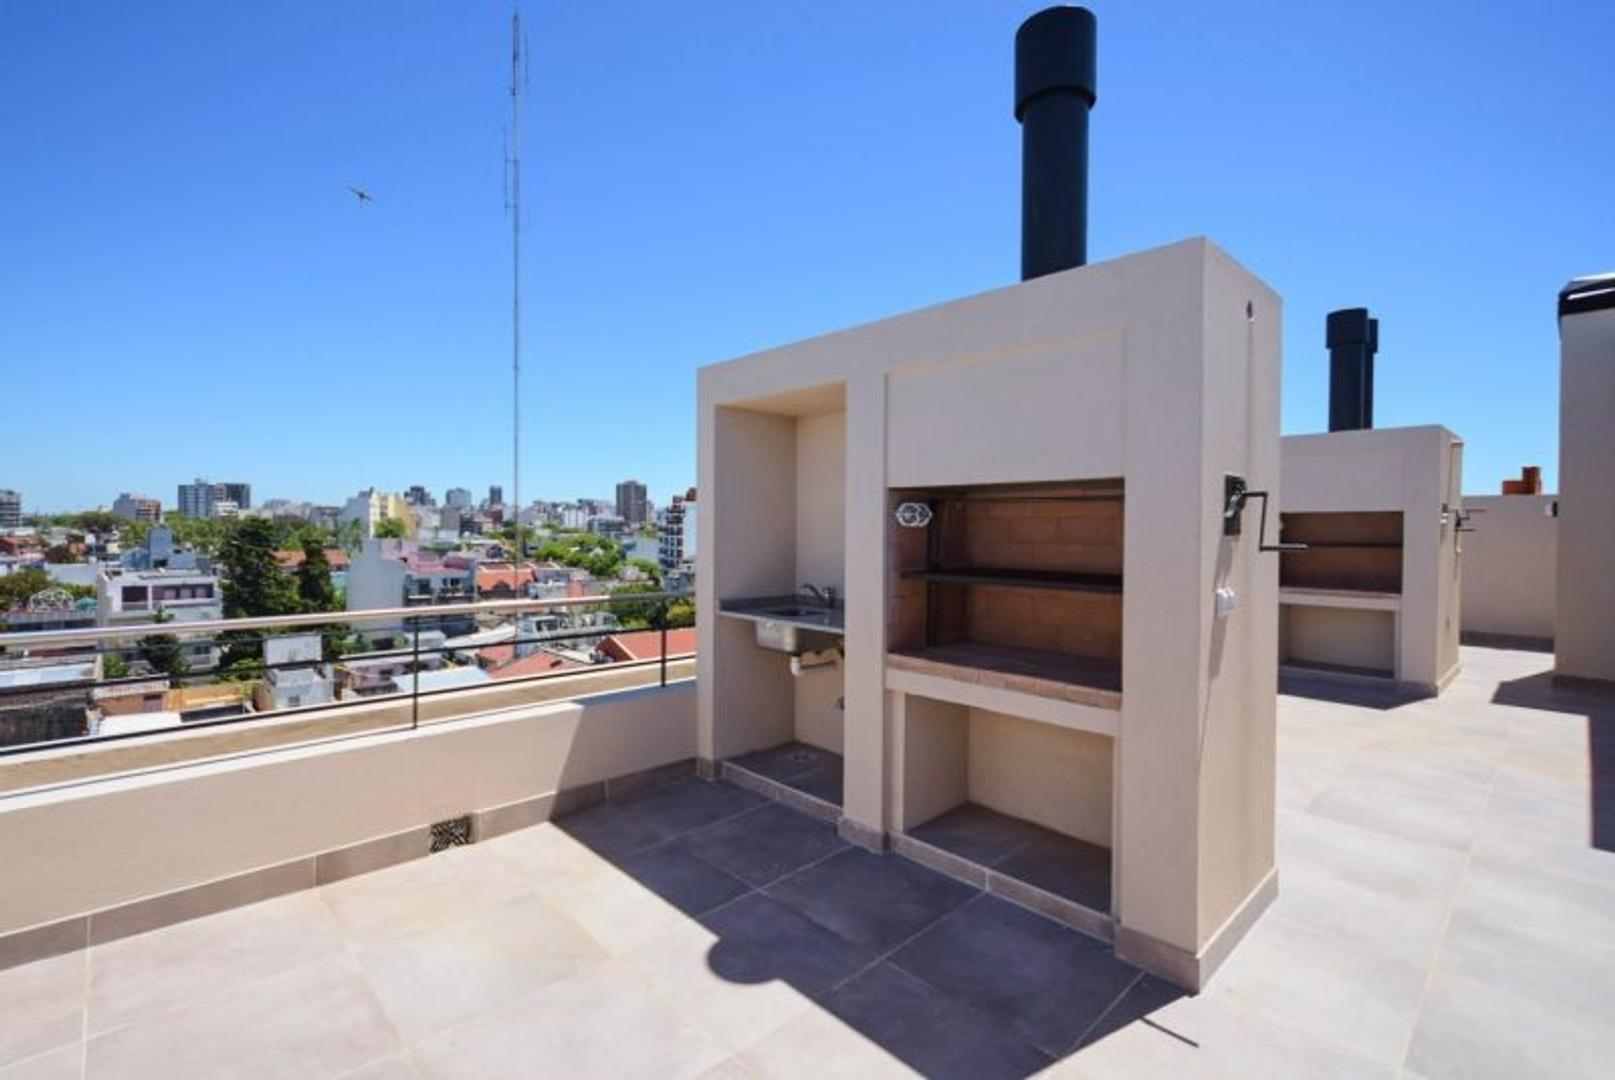 (CDP-CDP-374) Departamento - Venta - Argentina, Capital Federal - DONADO 1700 - Foto 22